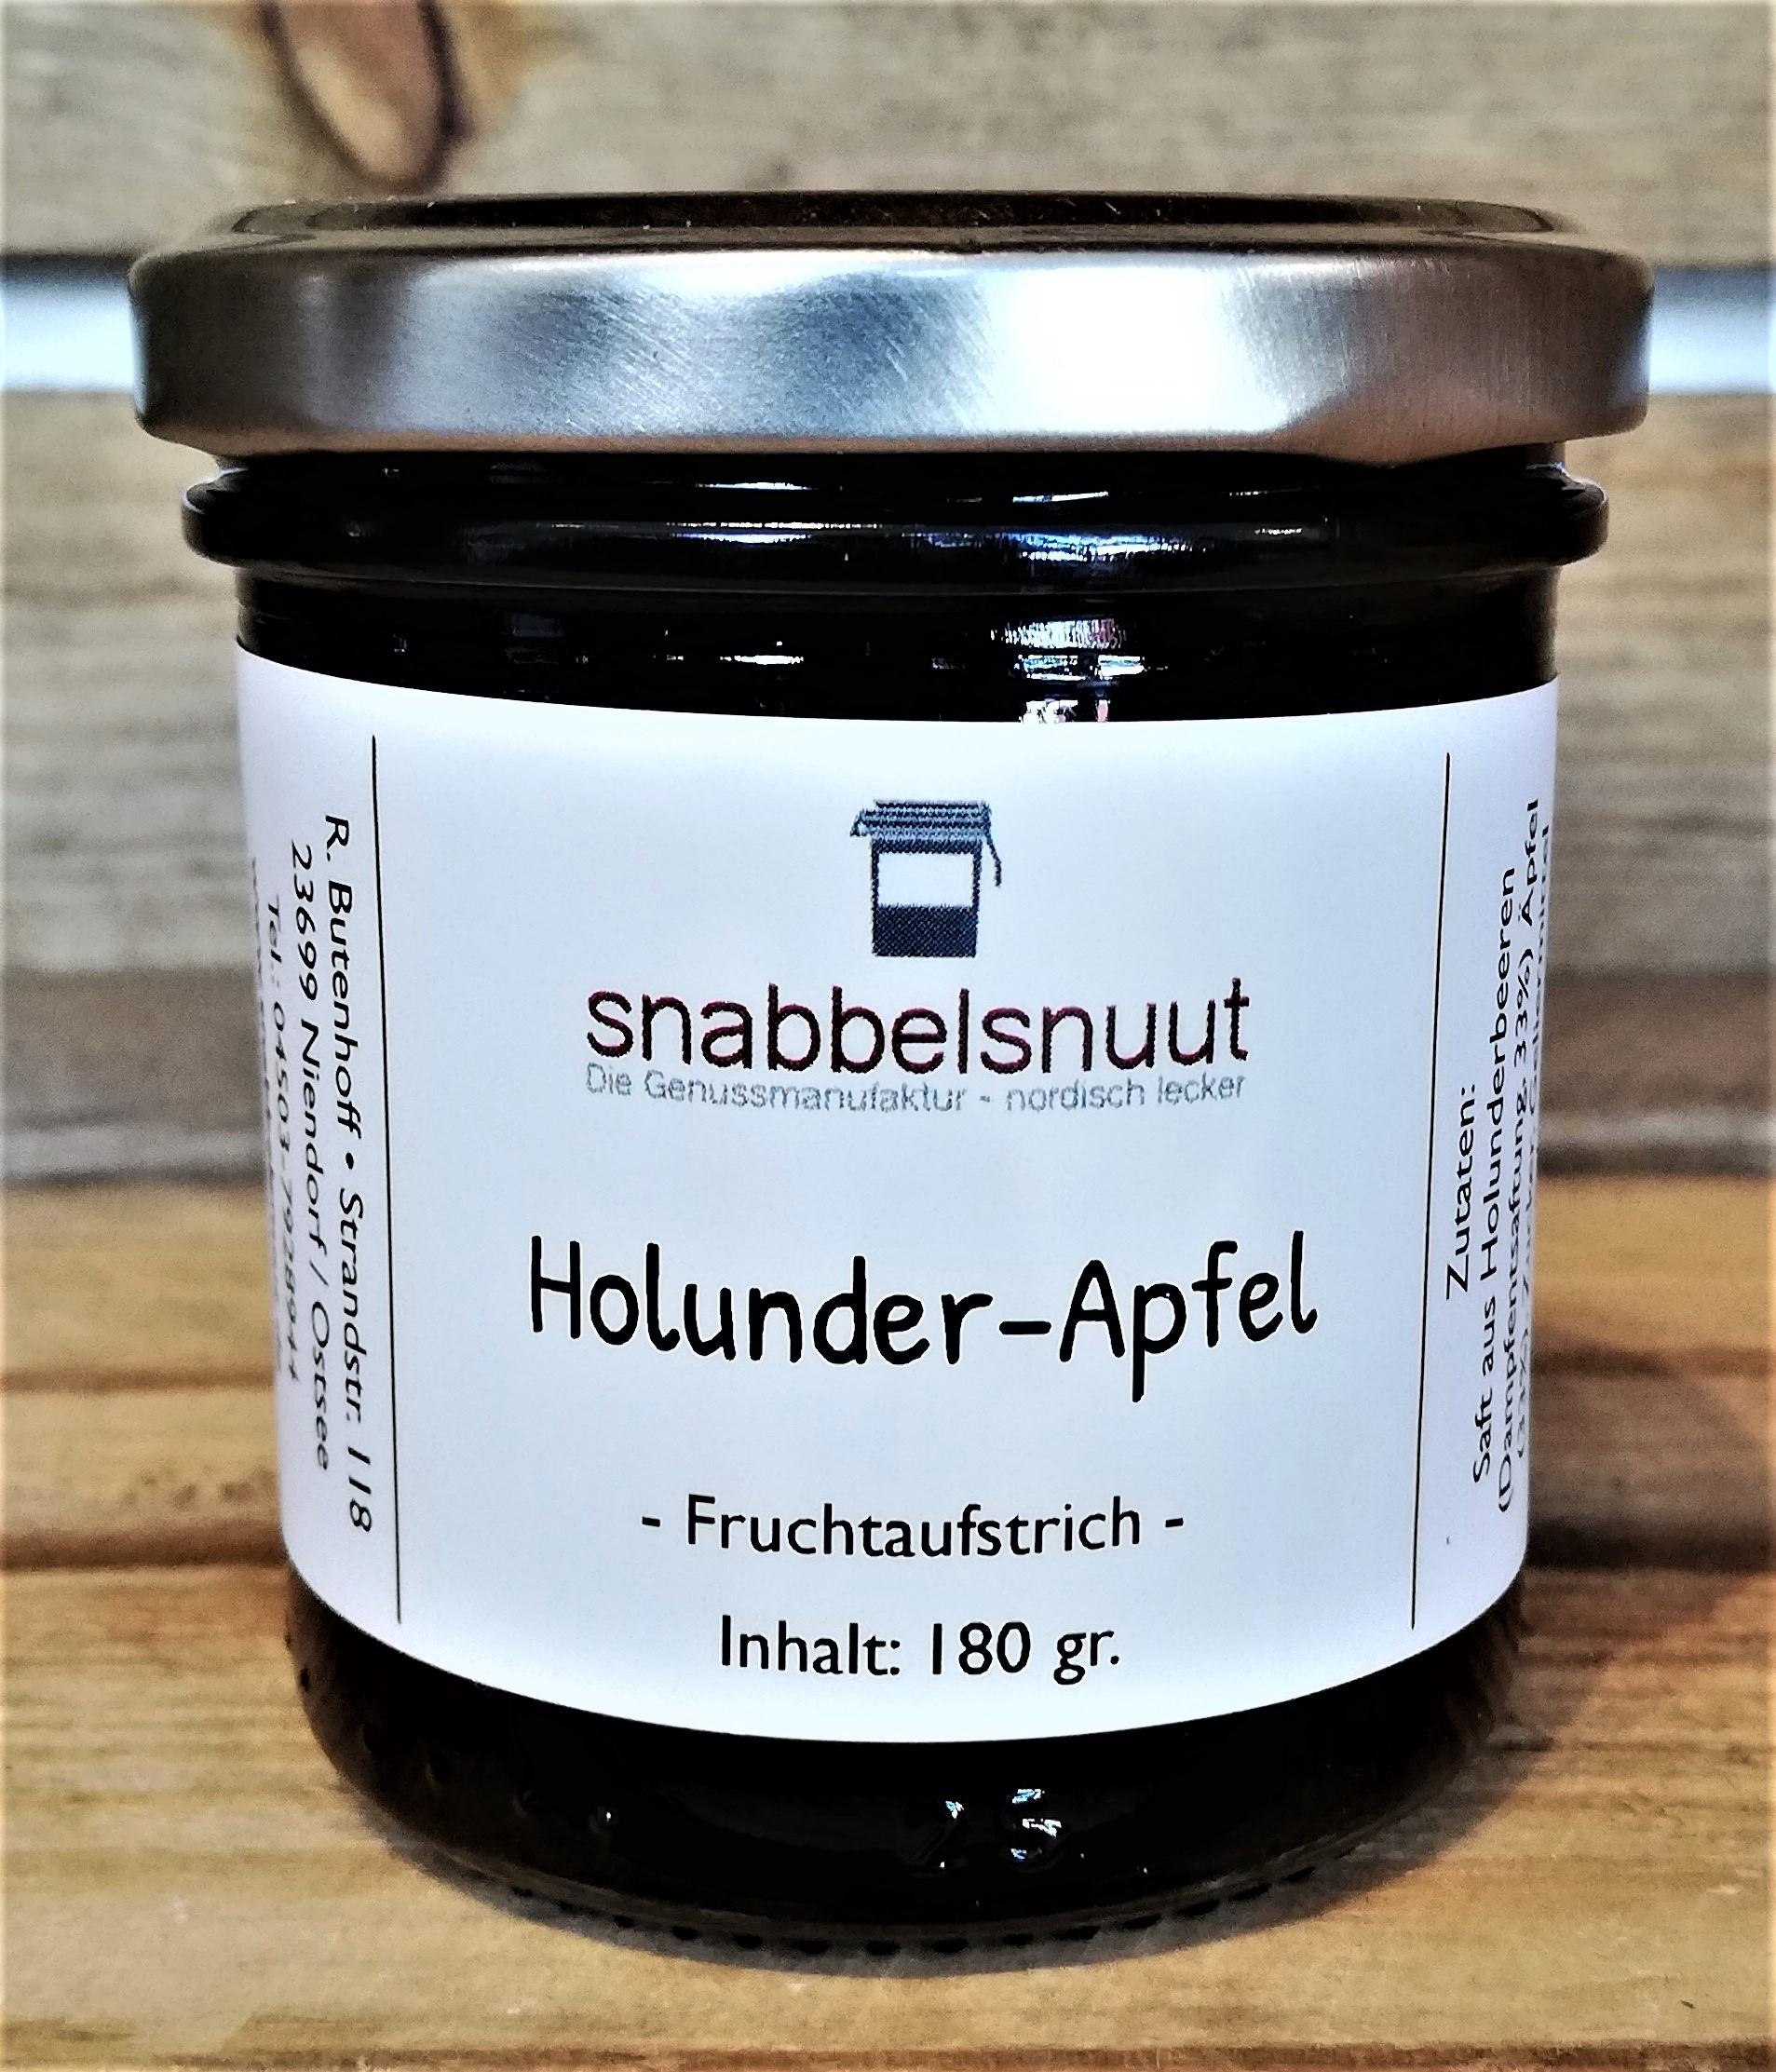 Holunder-Apfel